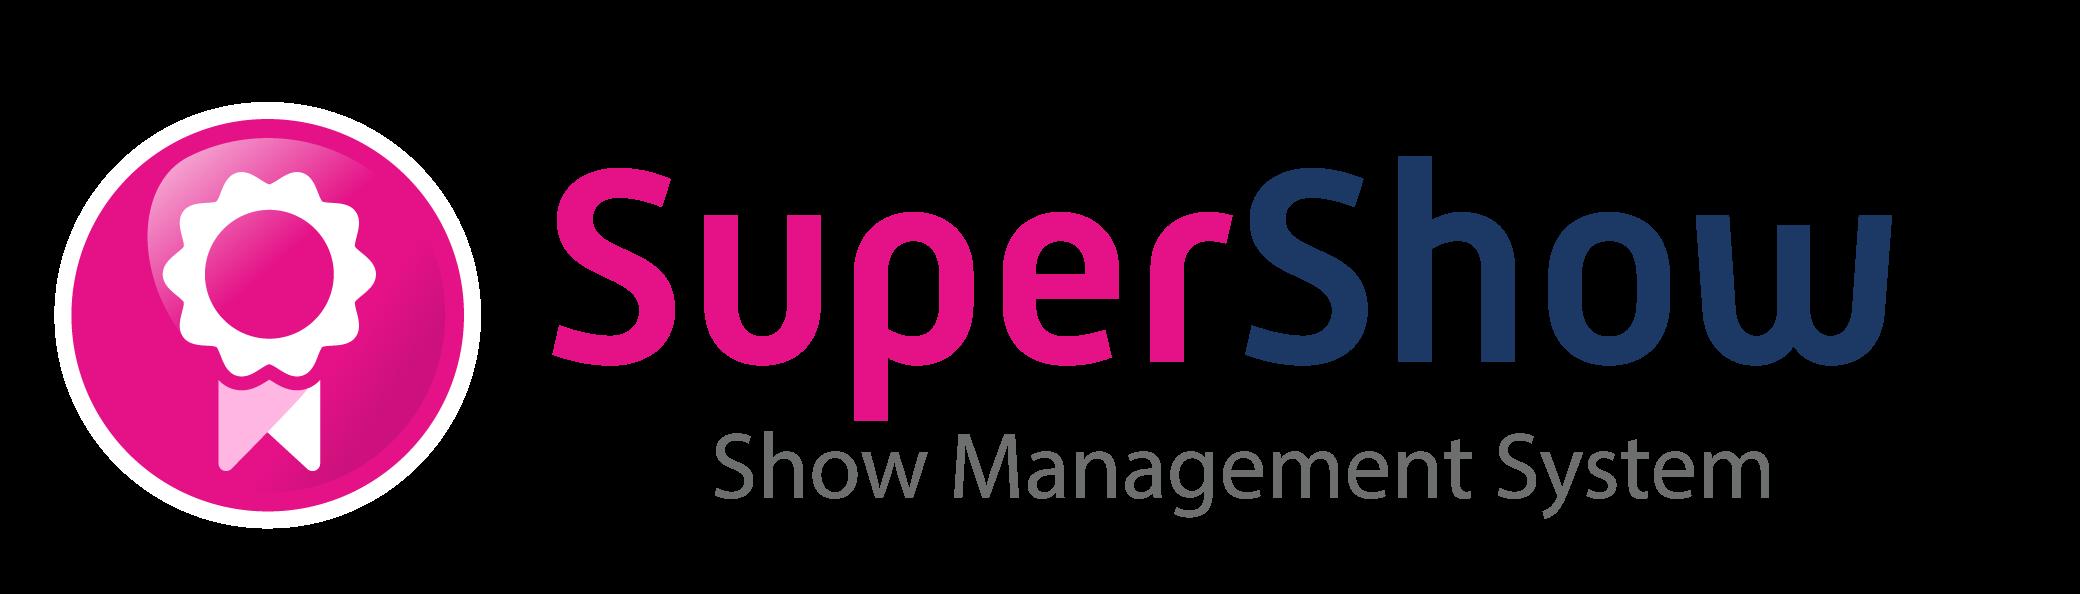 SuperShow Show Management Platform